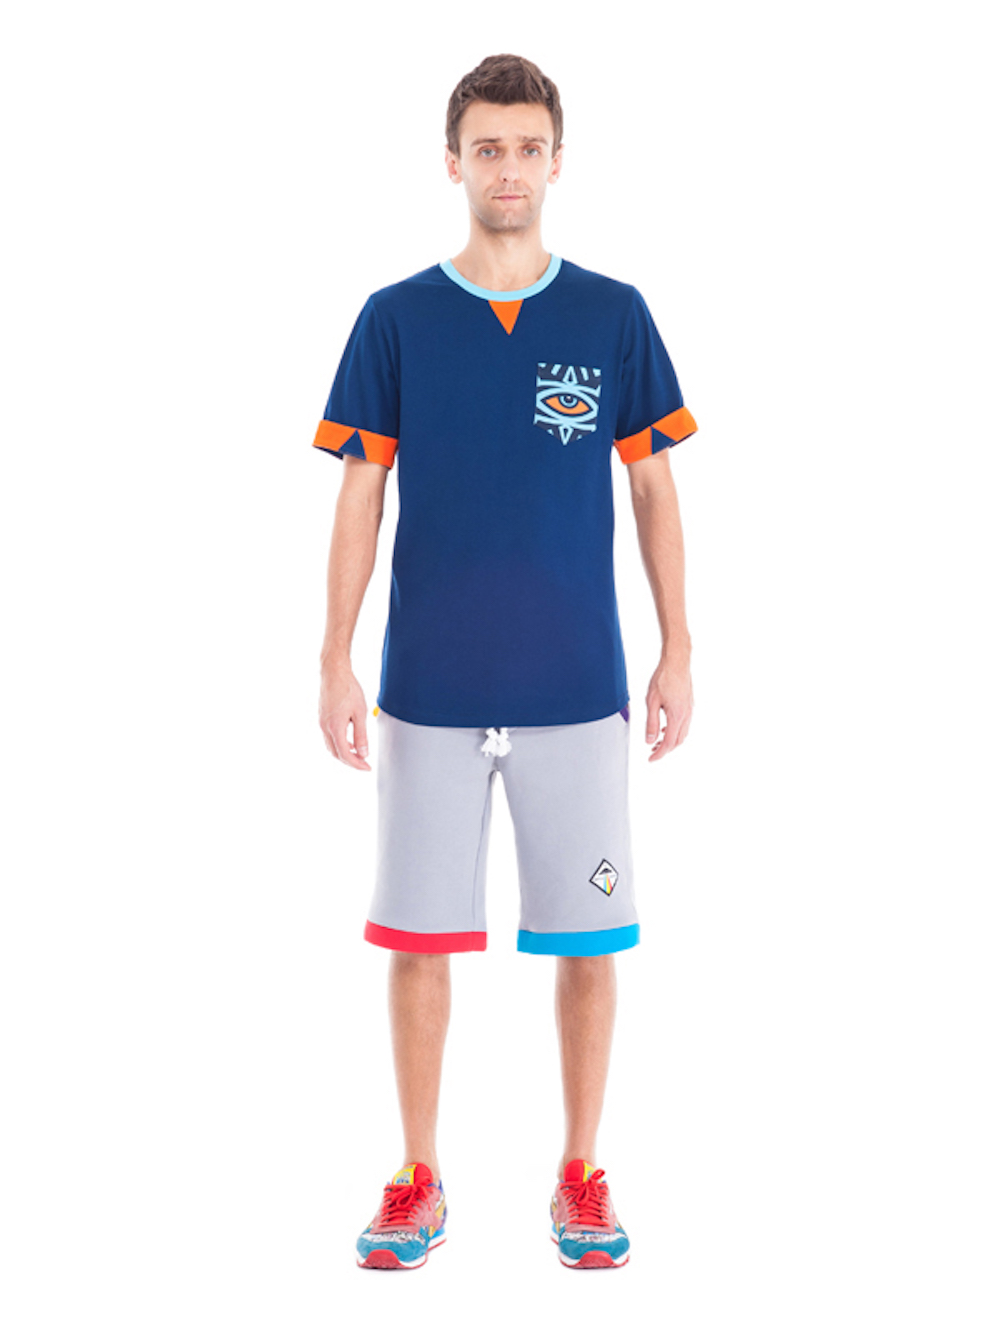 Horus Pocket T-shirt (Blue) - Okuaku